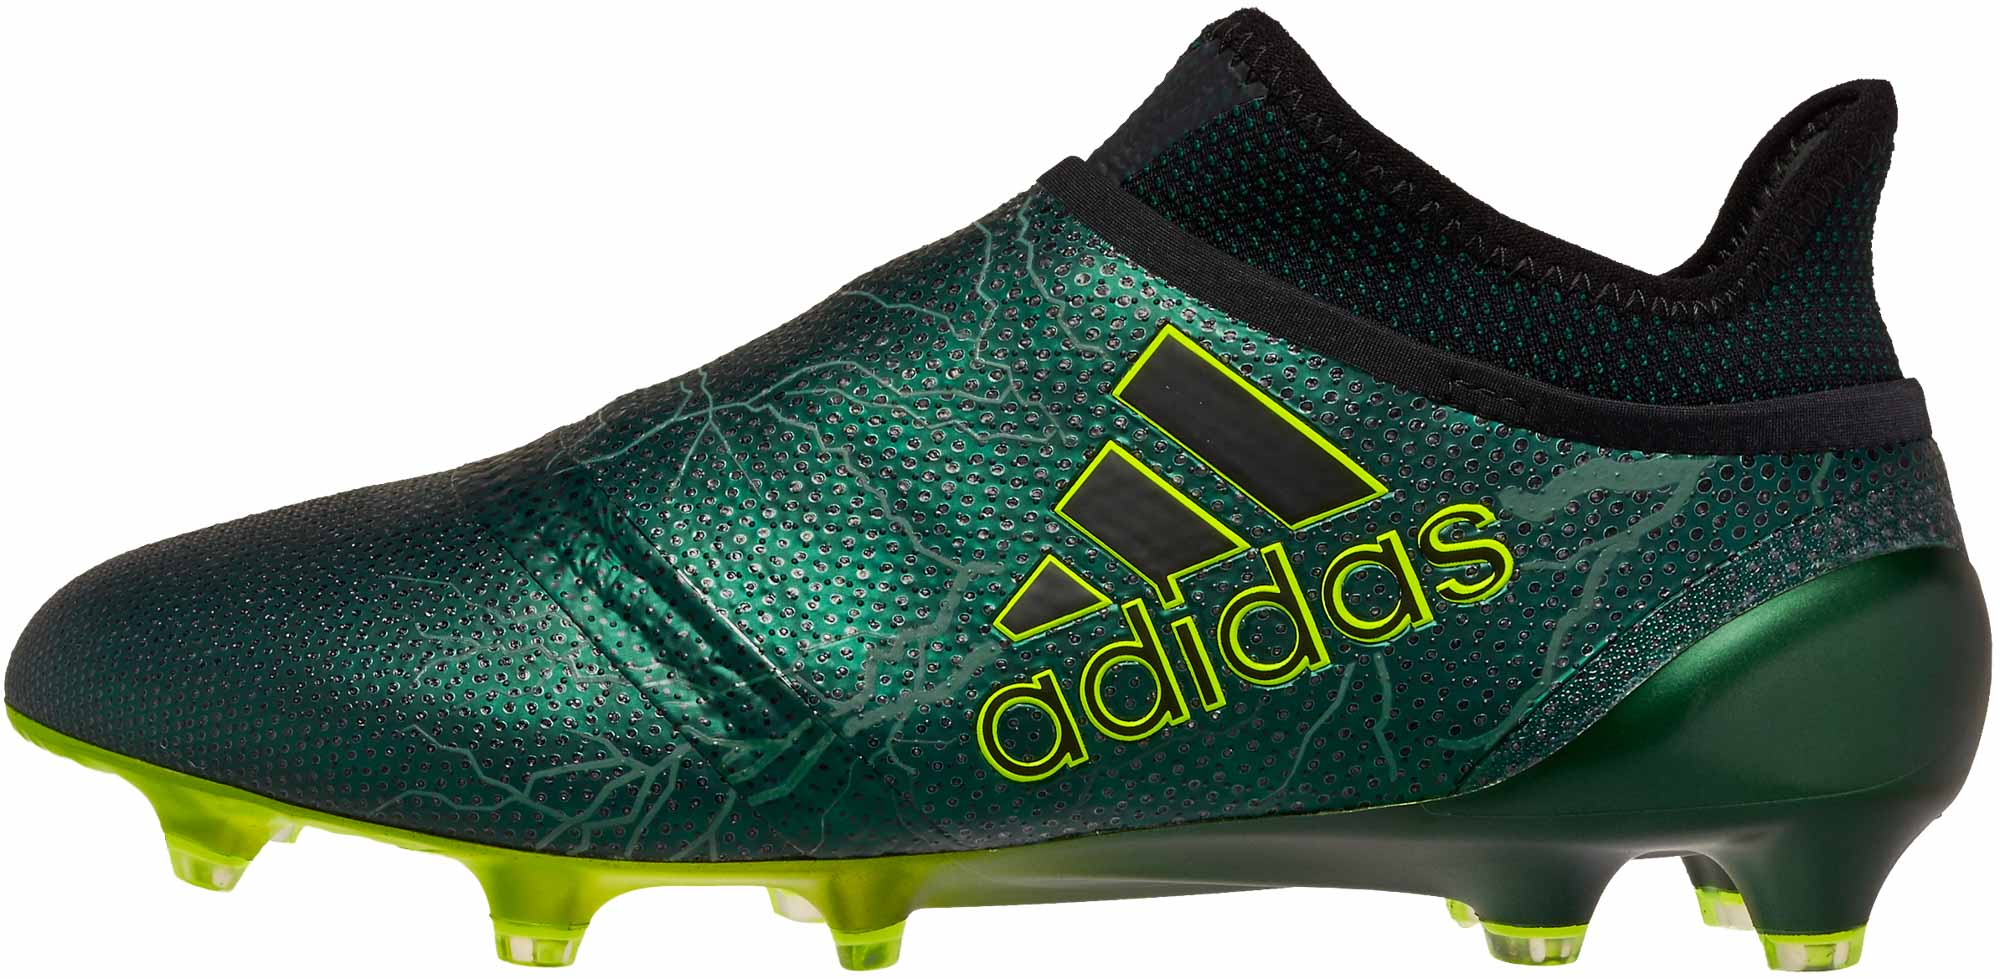 adidas X 17 PureSpeed FG - Black   Solar Yellow - SoccerPro.com ada5027d2ae0c